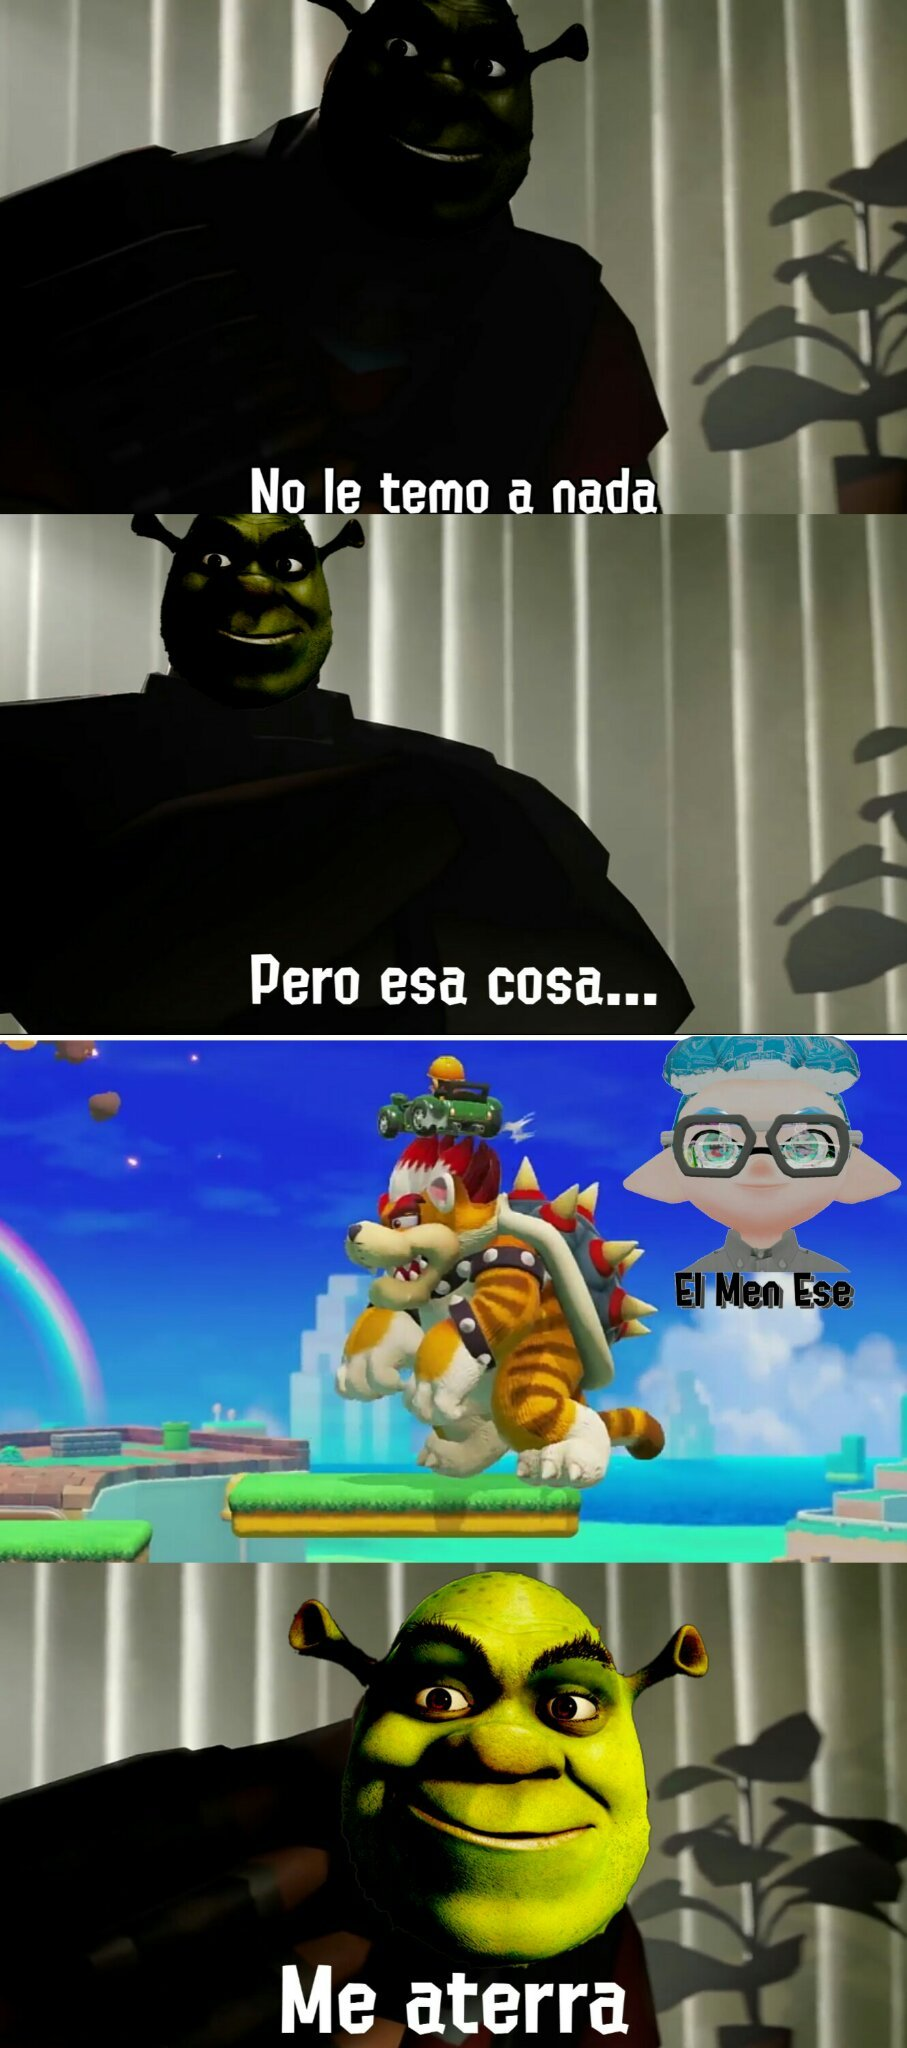 Tortuga+Gato+Mapache, Que puede salir mal? - meme